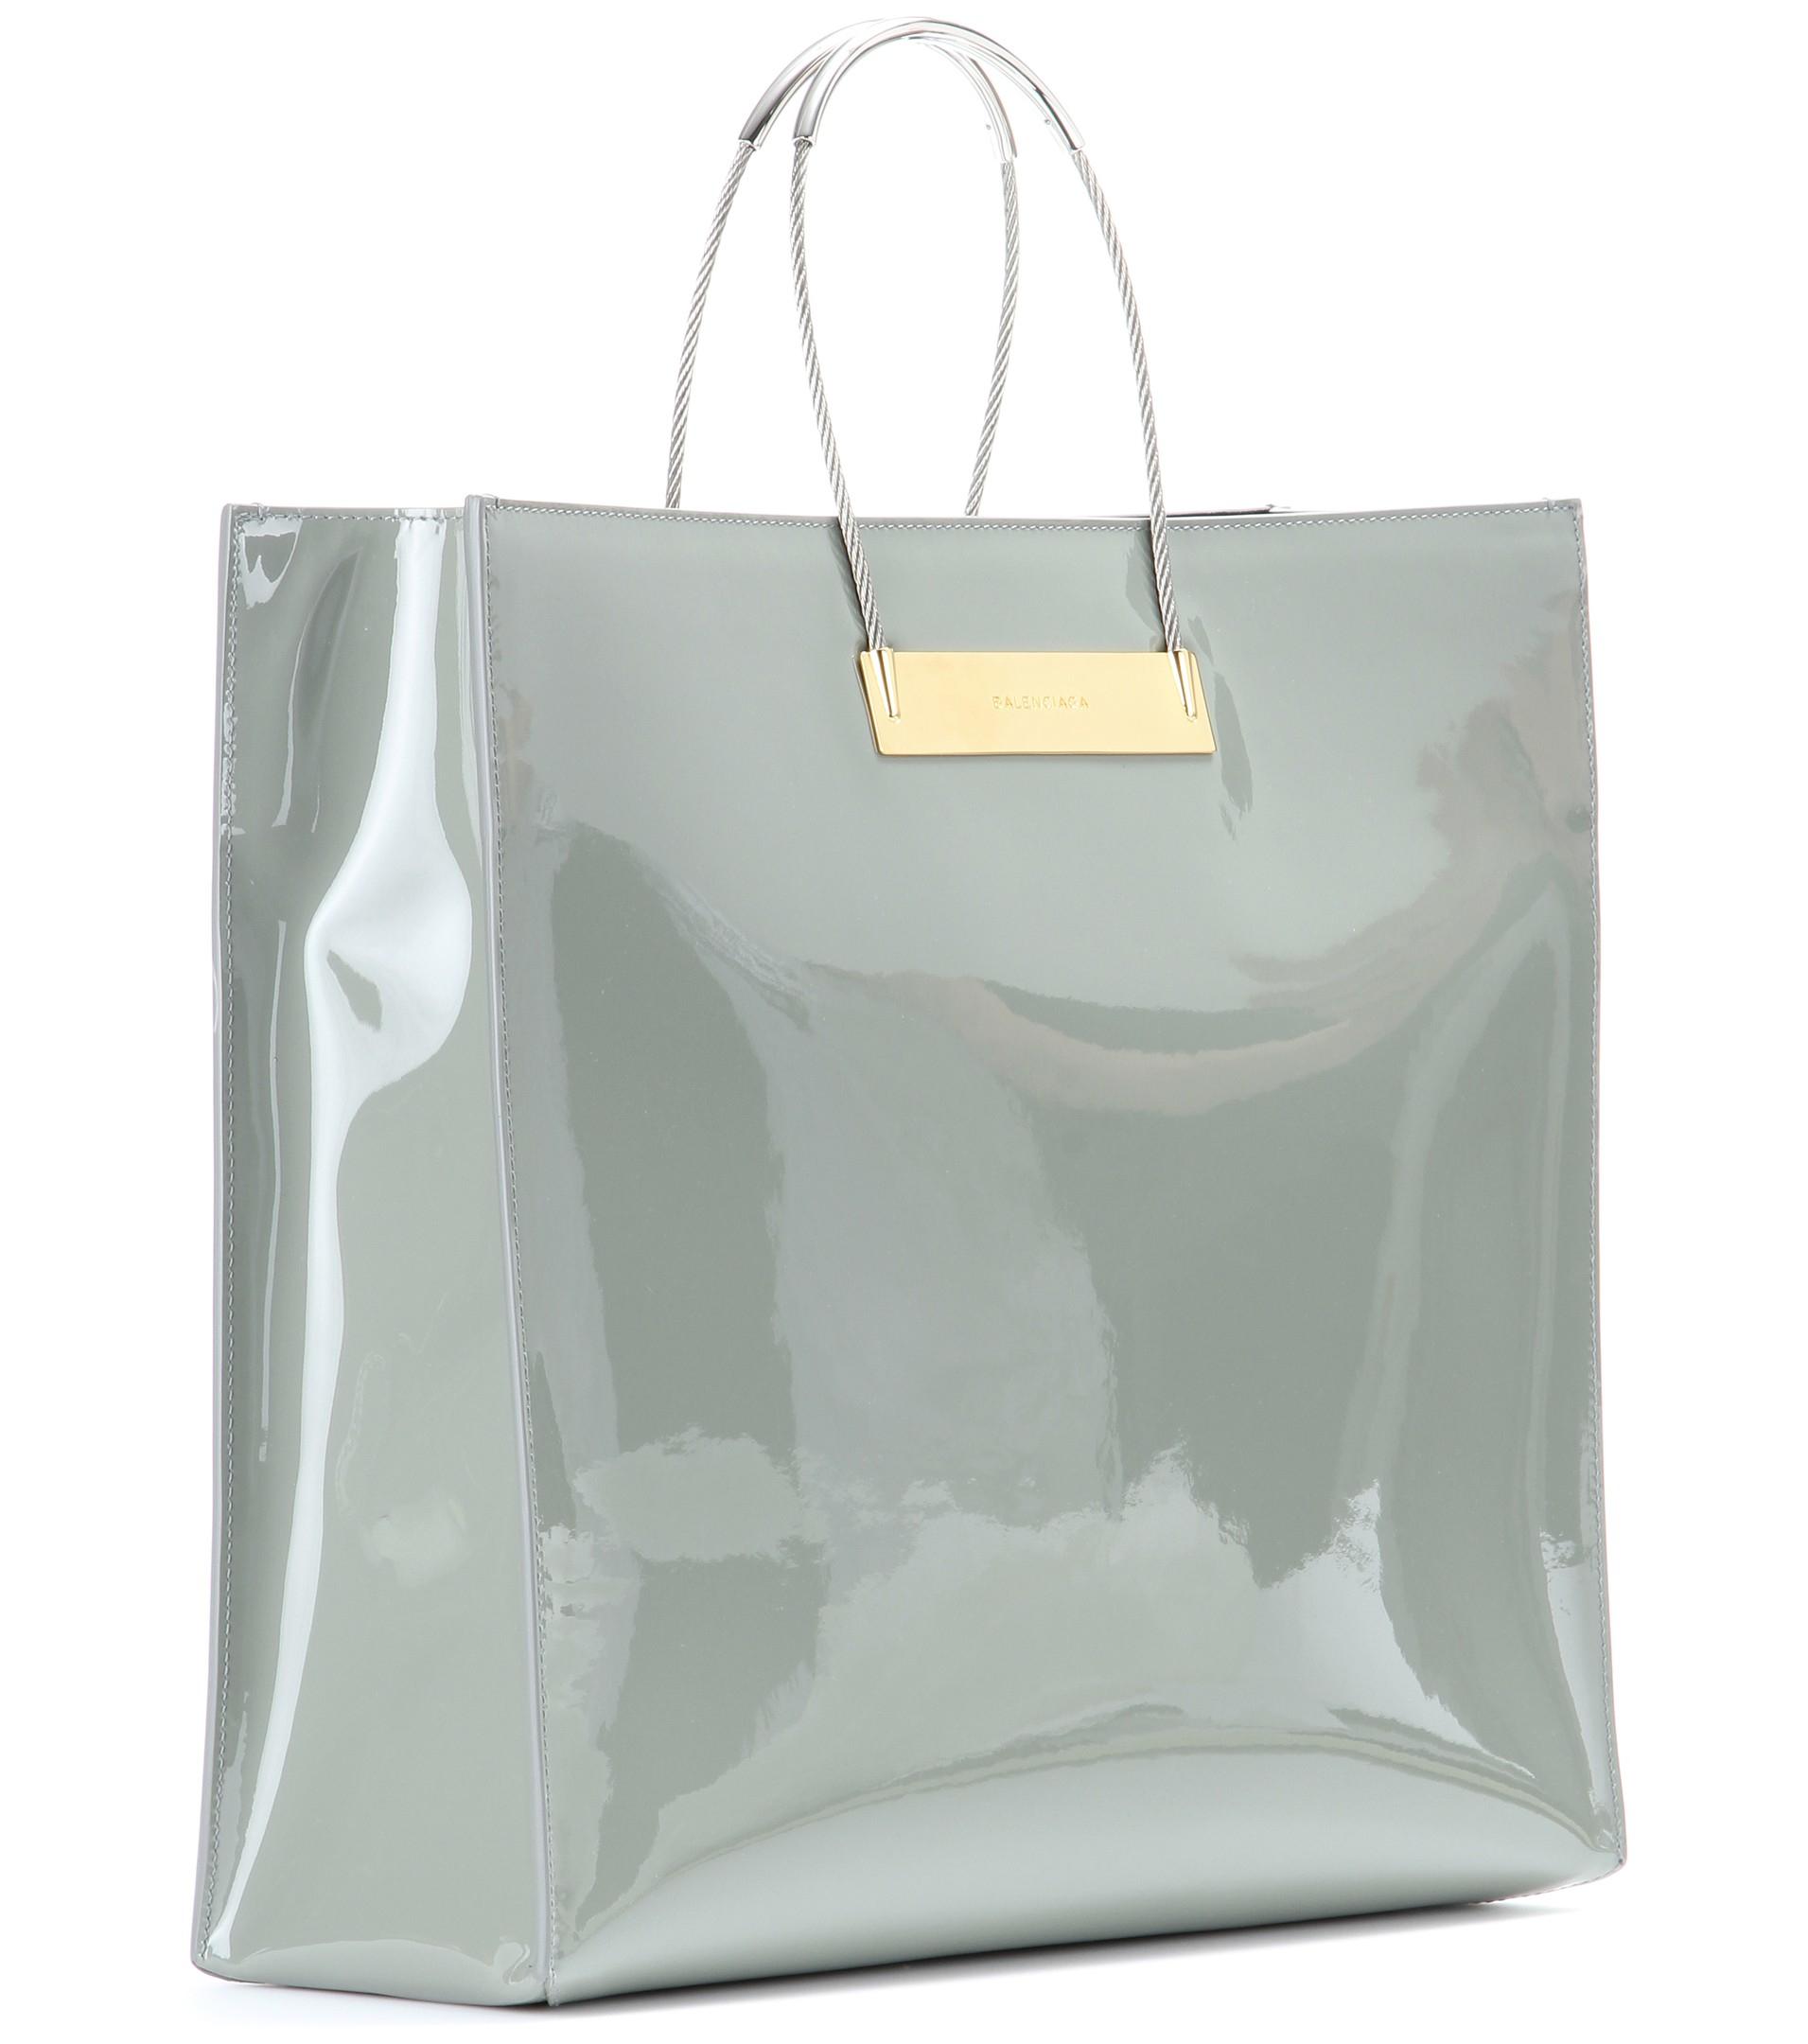 Balenciaga Cable Per Medium Patent Leather Bag In Metallic Lyst Mid Century White Purse Handbag By Rushcreekvintage